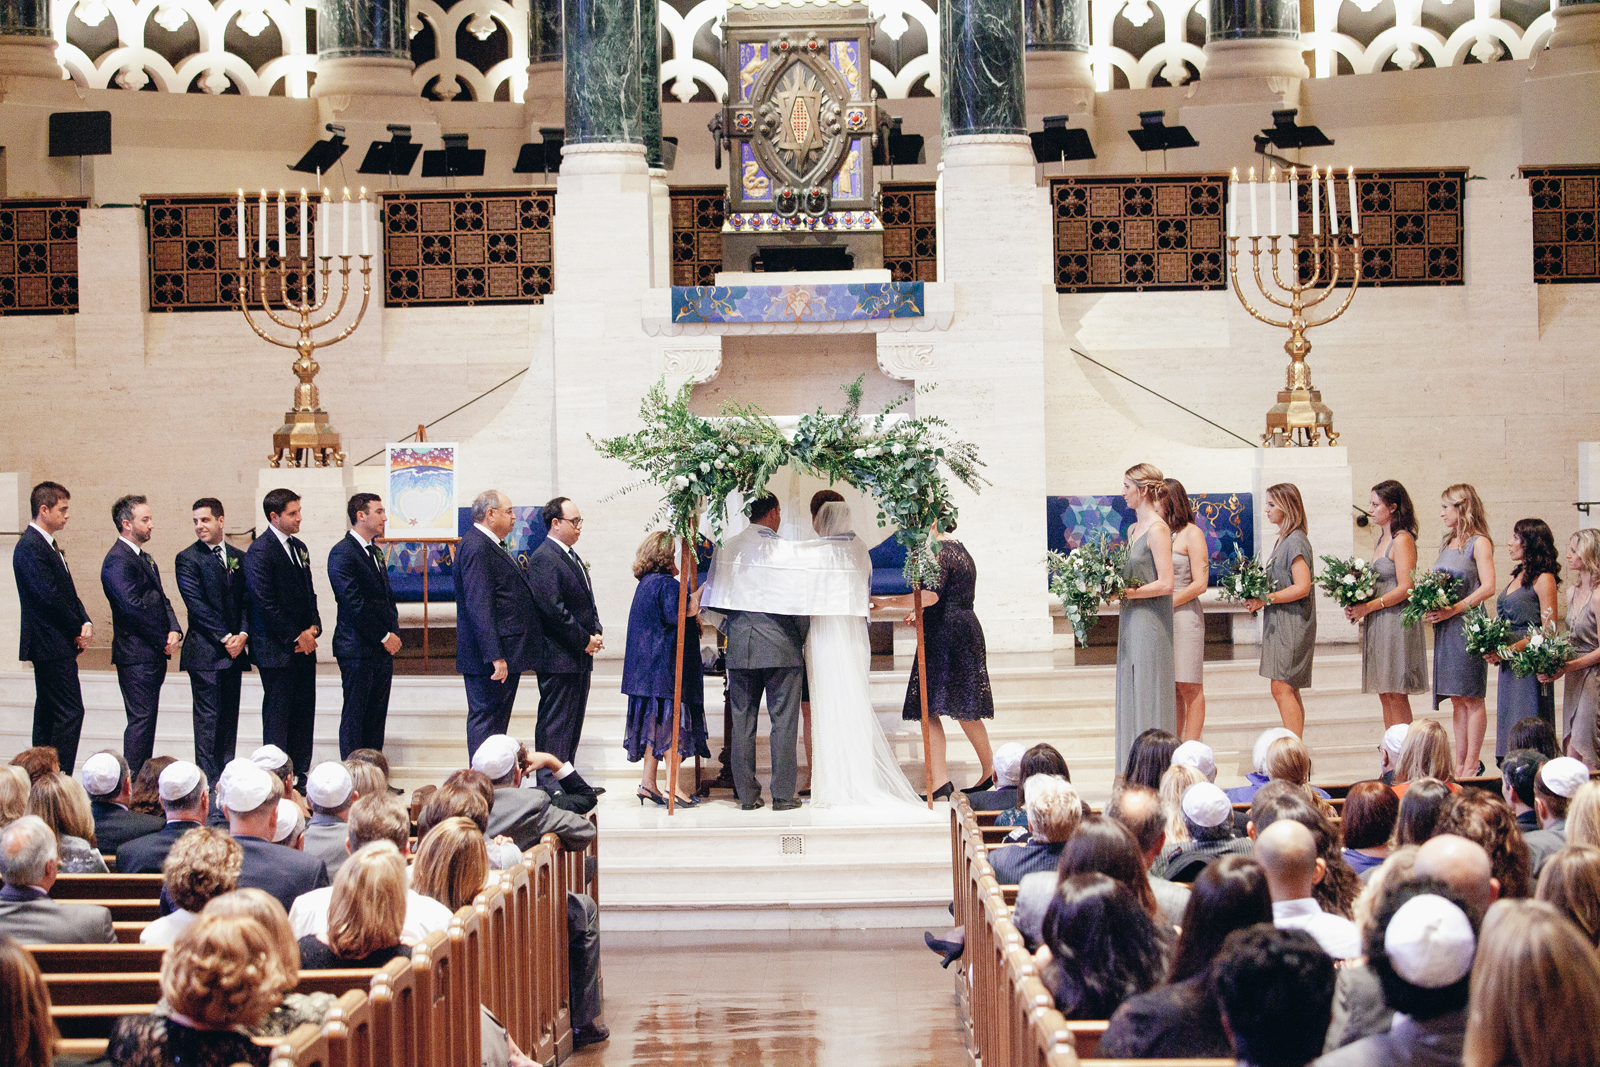 temple_emmanuel_jewish_wedding_san_francisco_ca_sarah_andrew_ebony_siovhan_bokeh_photography_53.jpg